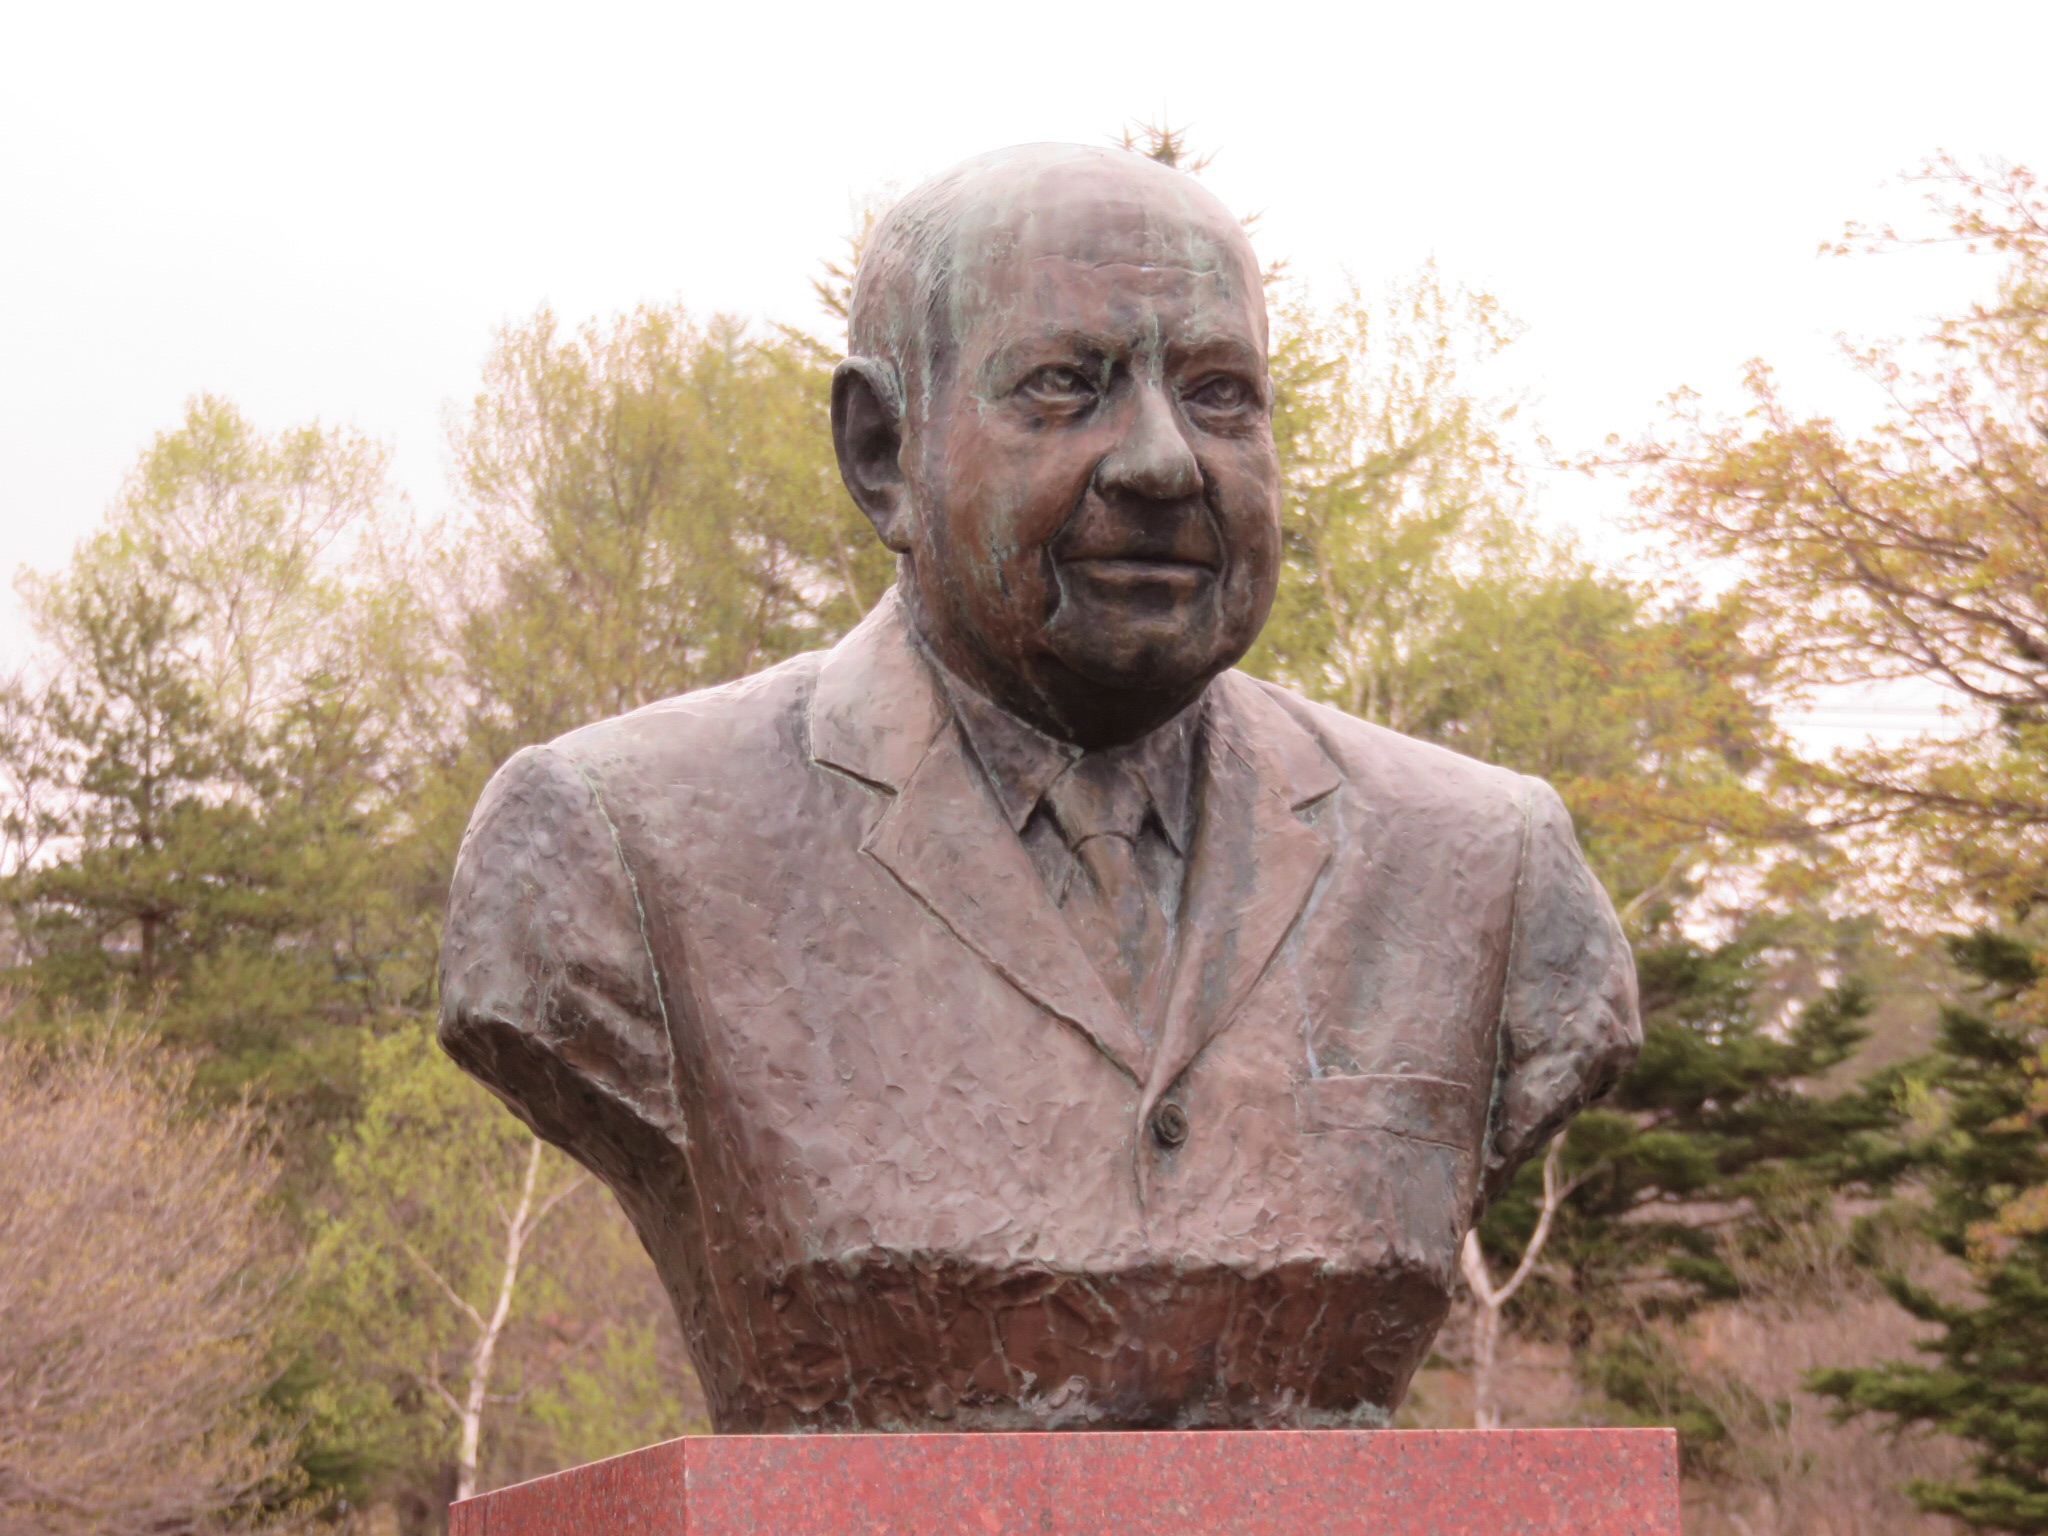 Paul Rusch Memorial, Kiyosato, Yamanashi